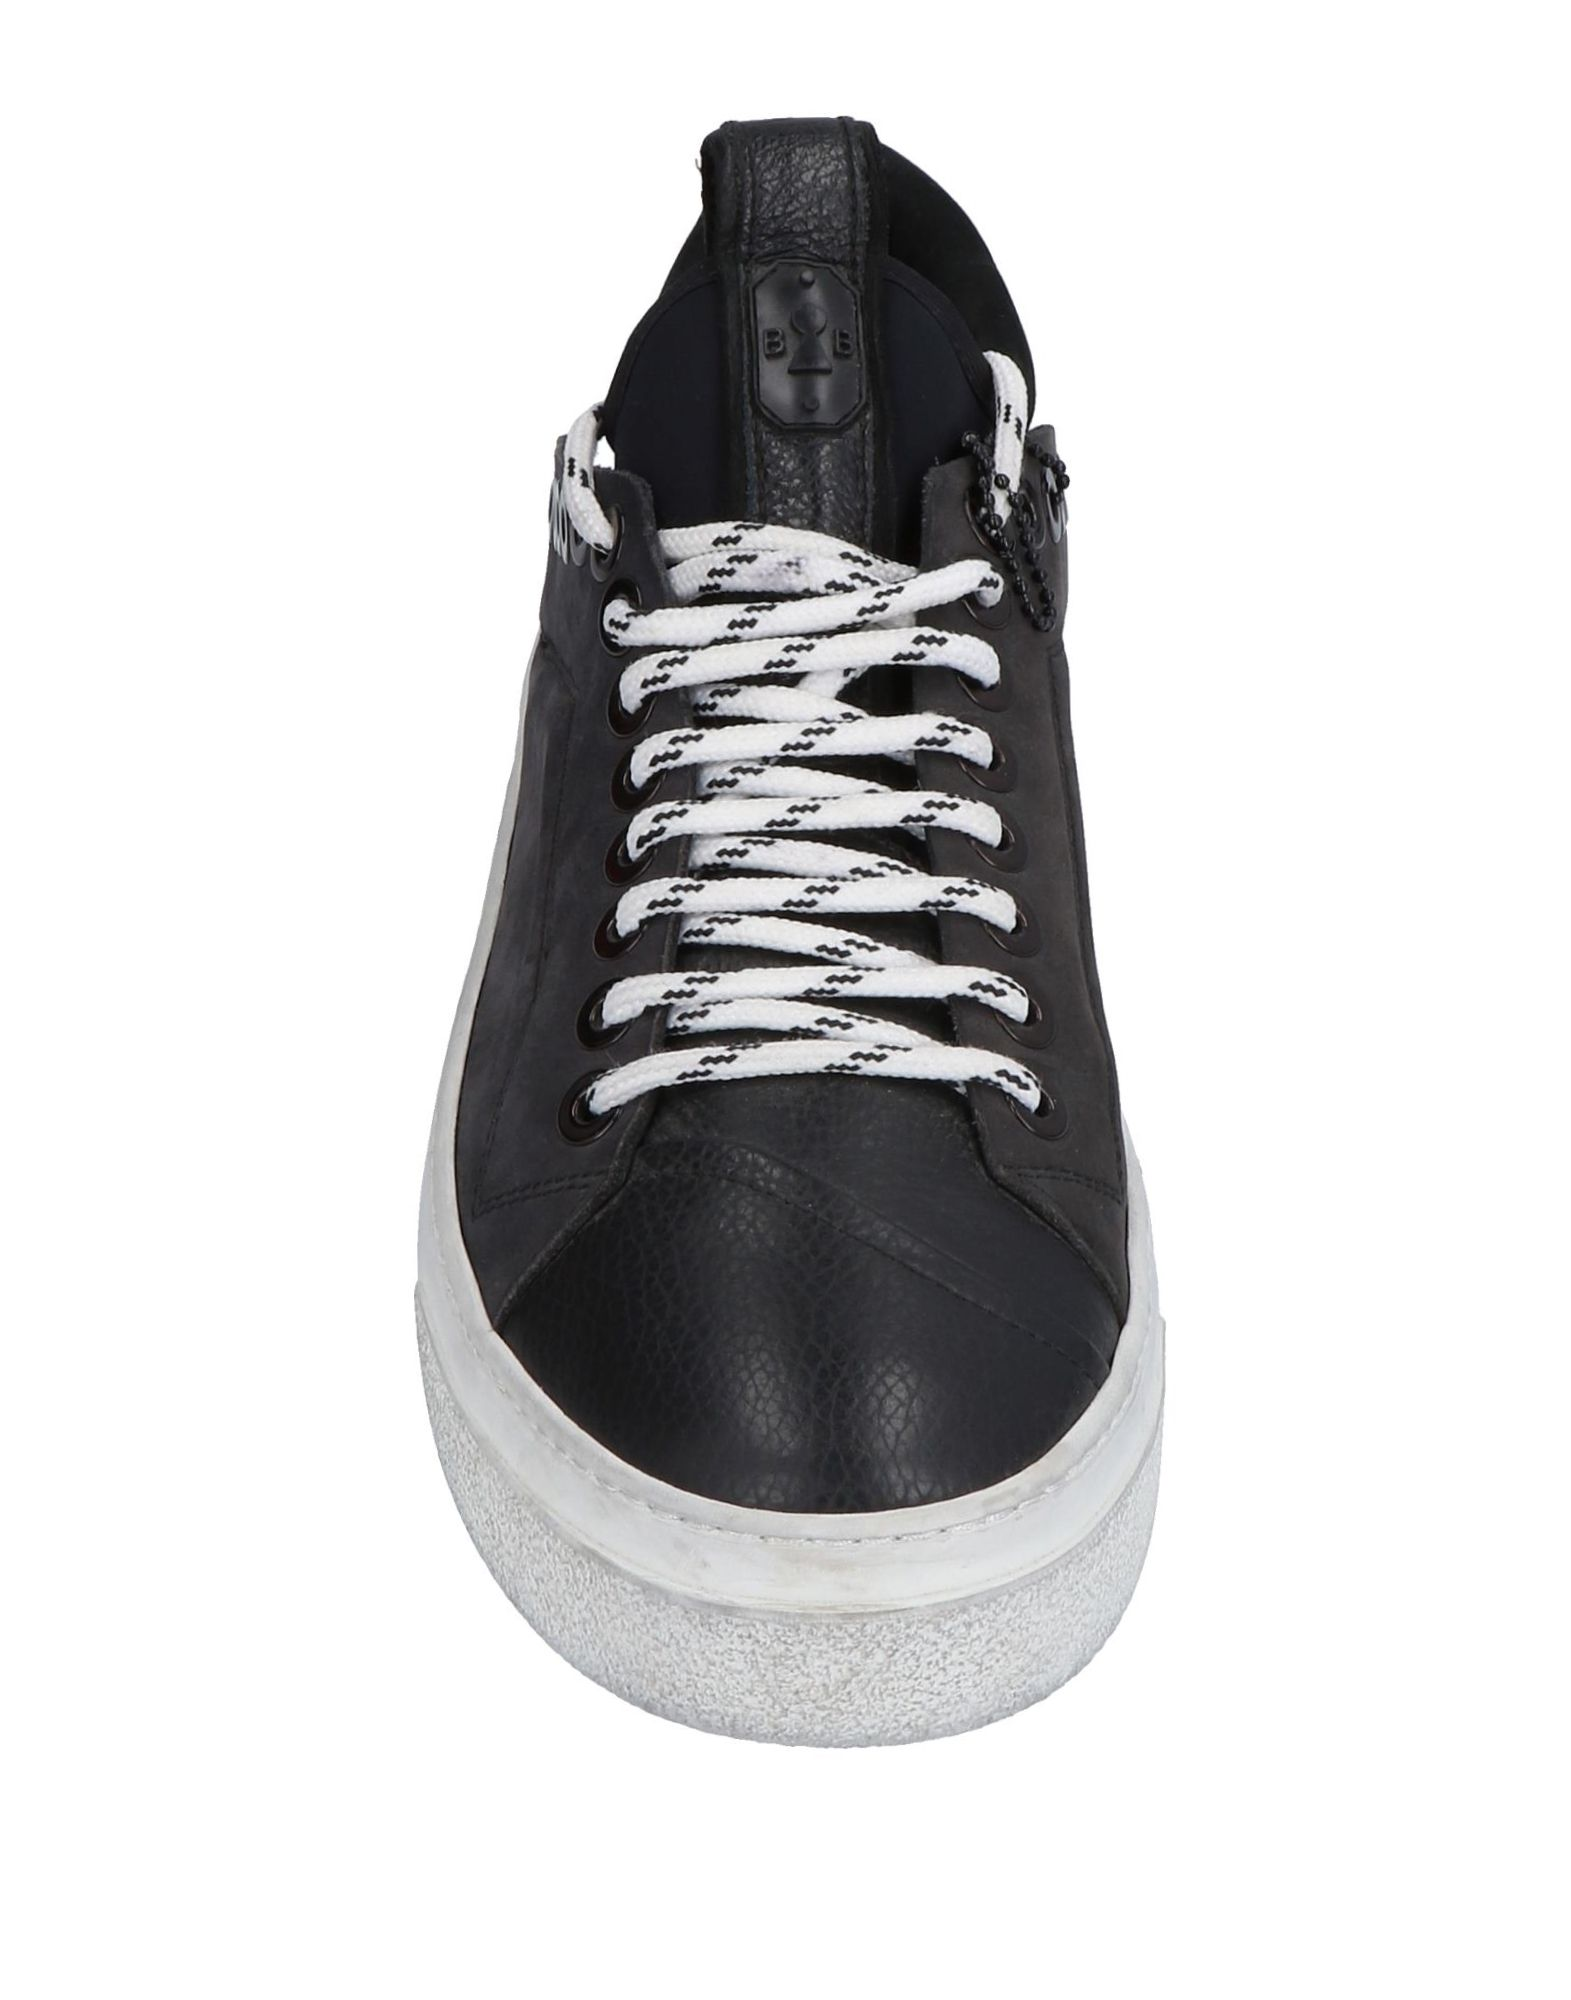 Bruno Bordese Sneakers Herren  11497605PX Gute Qualität beliebte Schuhe